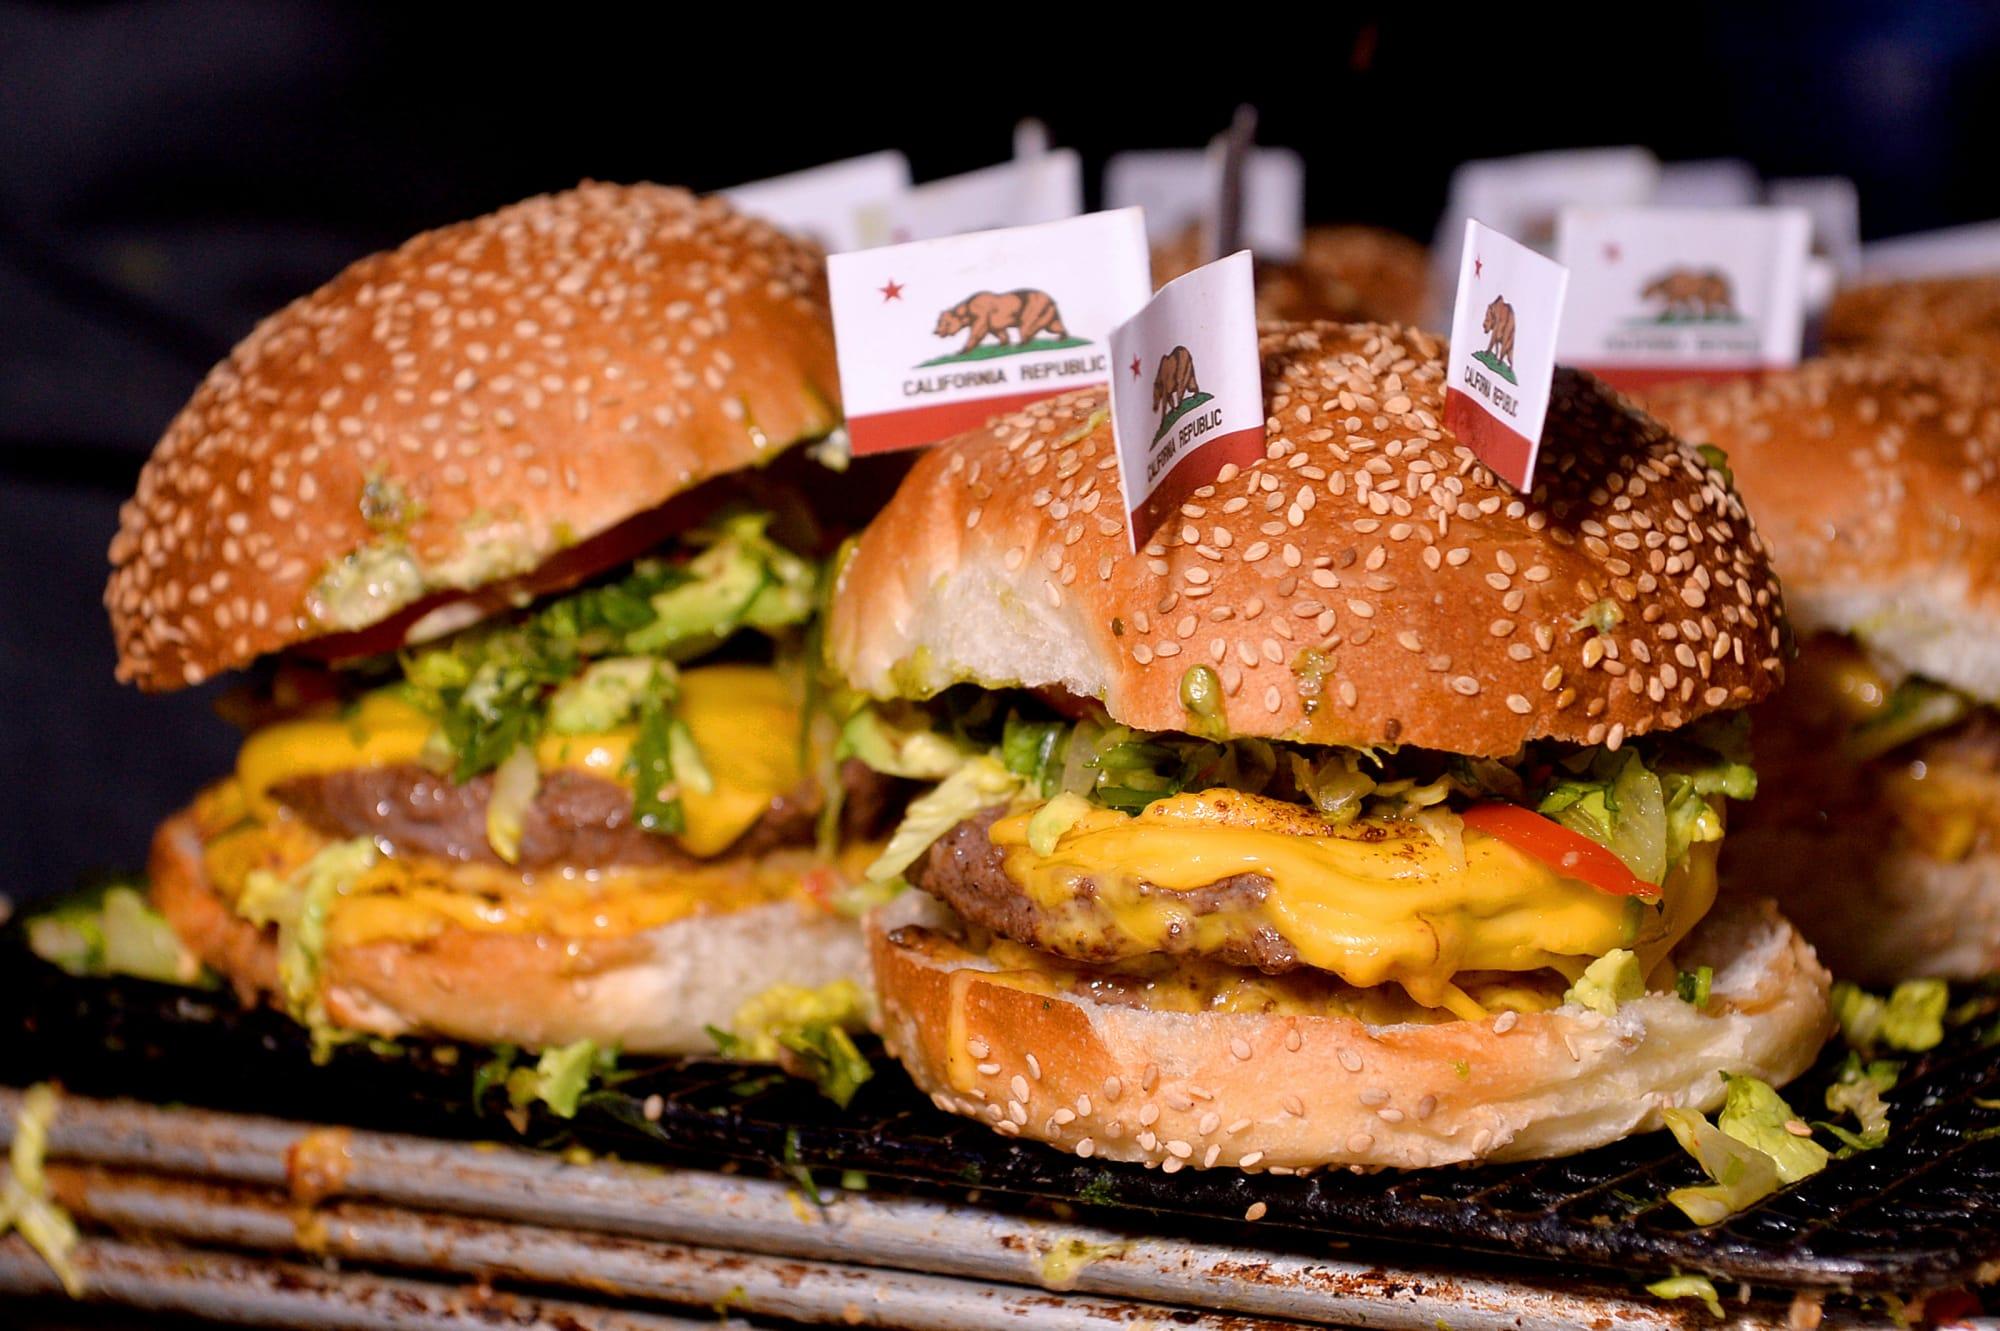 The Burger Showdown: Which celebrity burger reigns supreme?